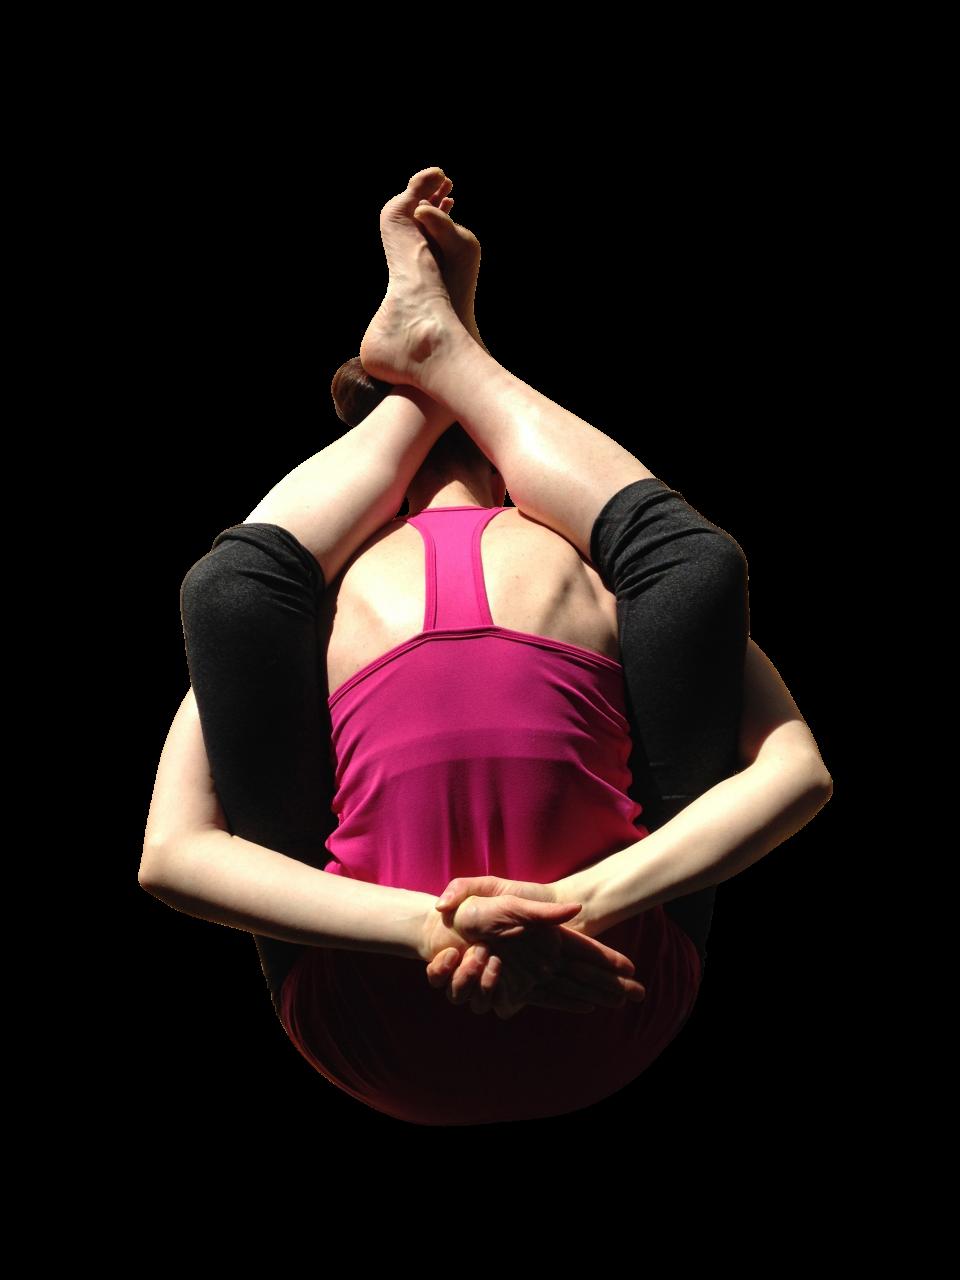 Woman exercising PNG Image